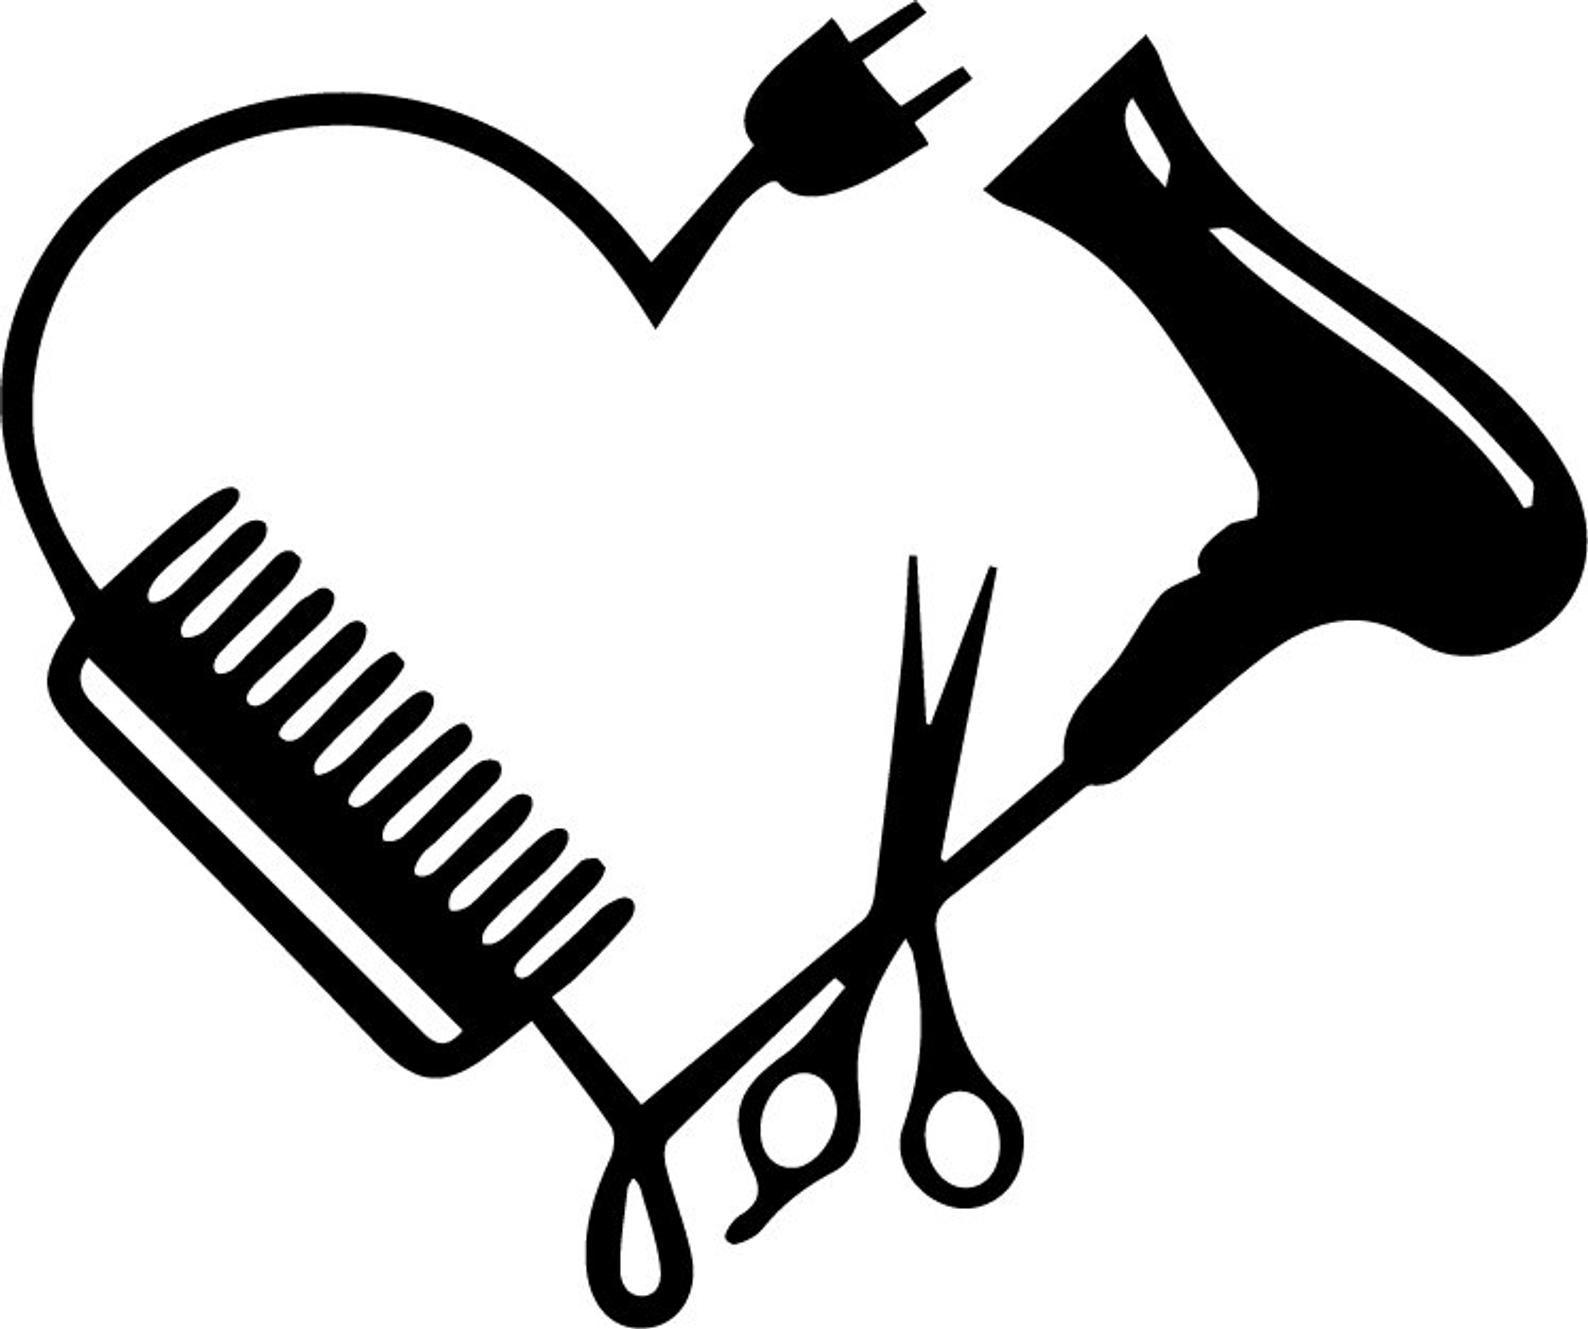 Download Hairdresser Heart SVG | Etsy in 2020 | Hair stylist logo ...